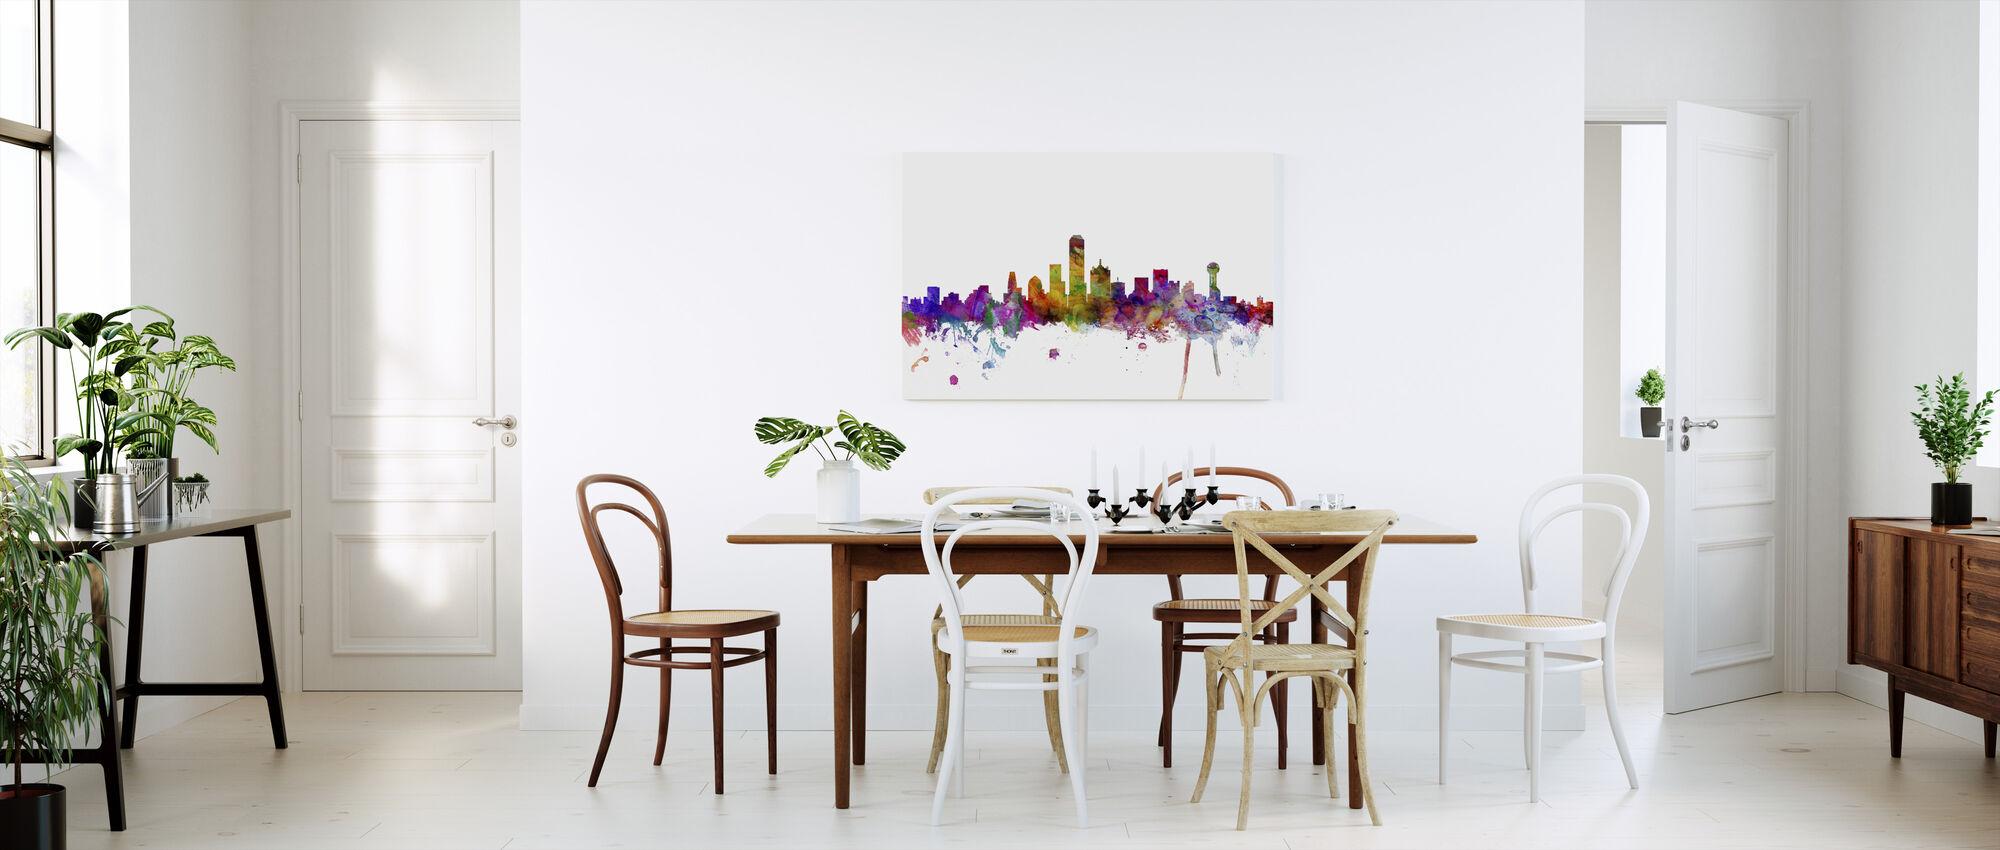 Dallas Texas Skyline - Canvas print - Kitchen